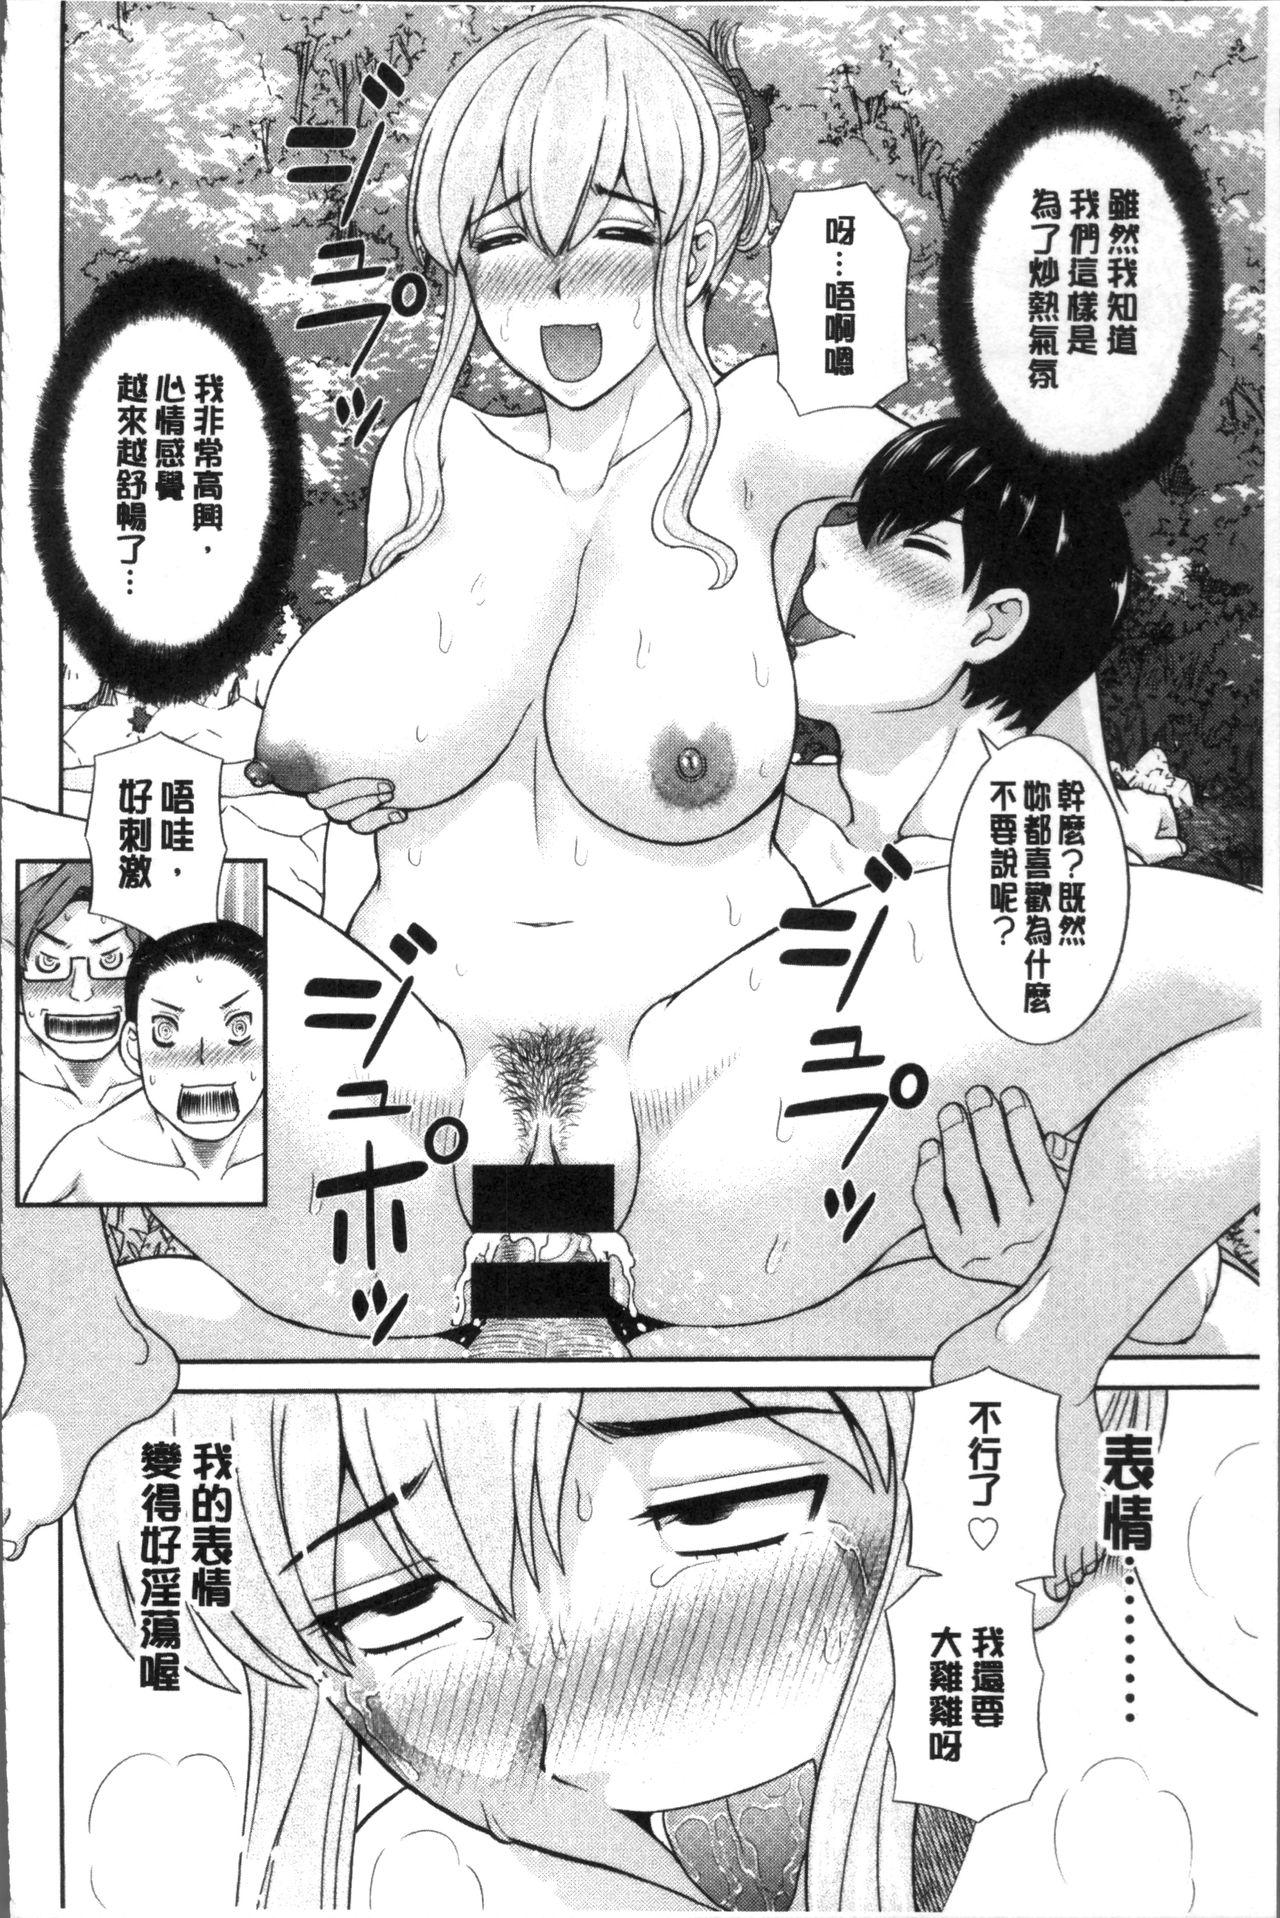 [Kawamori Misaki] Innyuu Shufu no Futei Ganbou - Oku-san to Kanojo to 2 | 淫乳主婦的不貞願望 和人妻也和女友❤2 [Chinese] 91